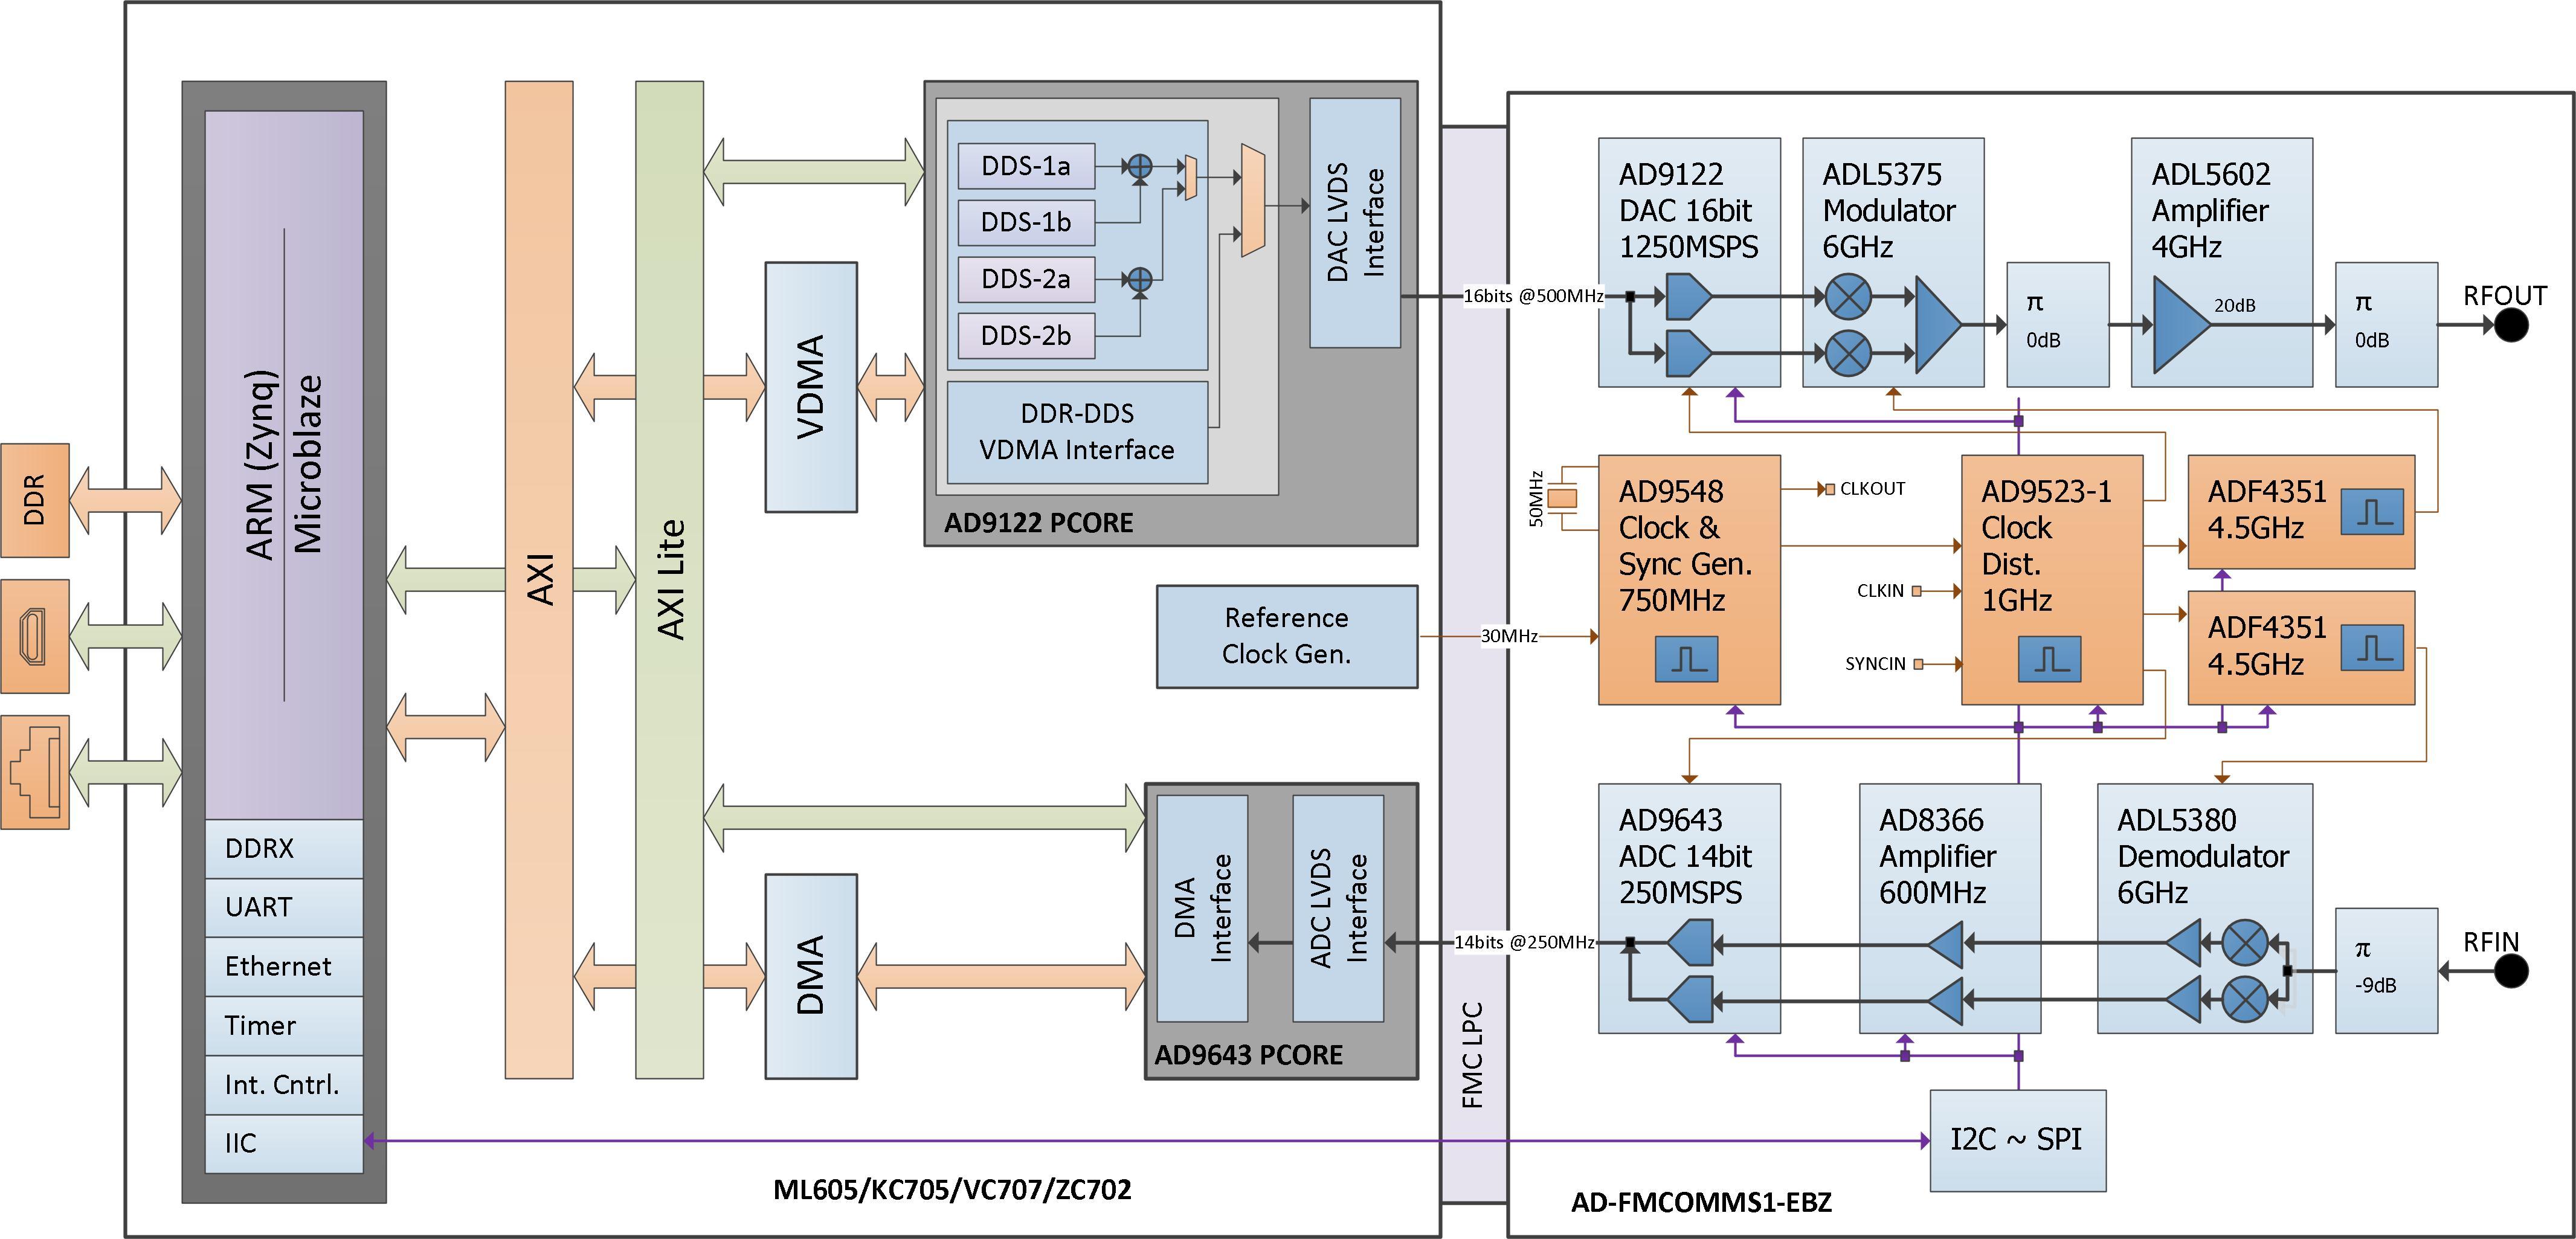 http://wiki.analog.com/_media/resources/fpga/xilinx/fmc/cf_xcomm_kc705_bd.jpg?cache=